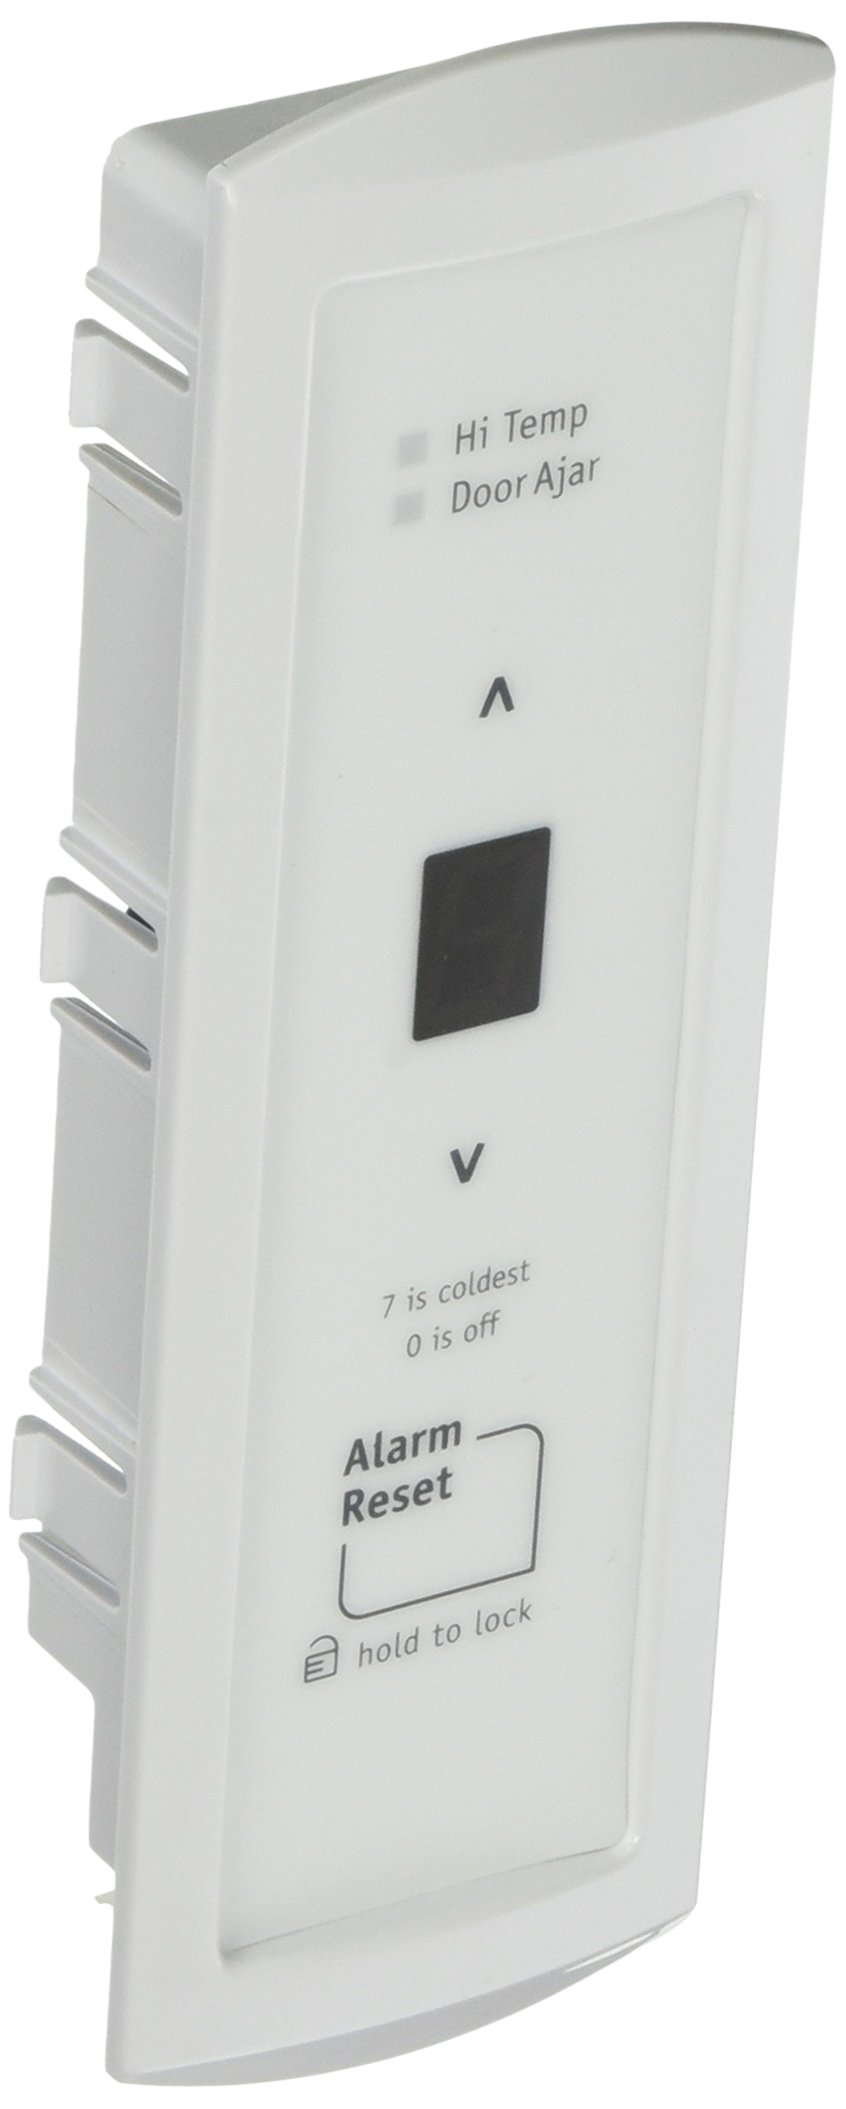 FRIGIDAIRE 297370600 Electronic Control by Frigidaire